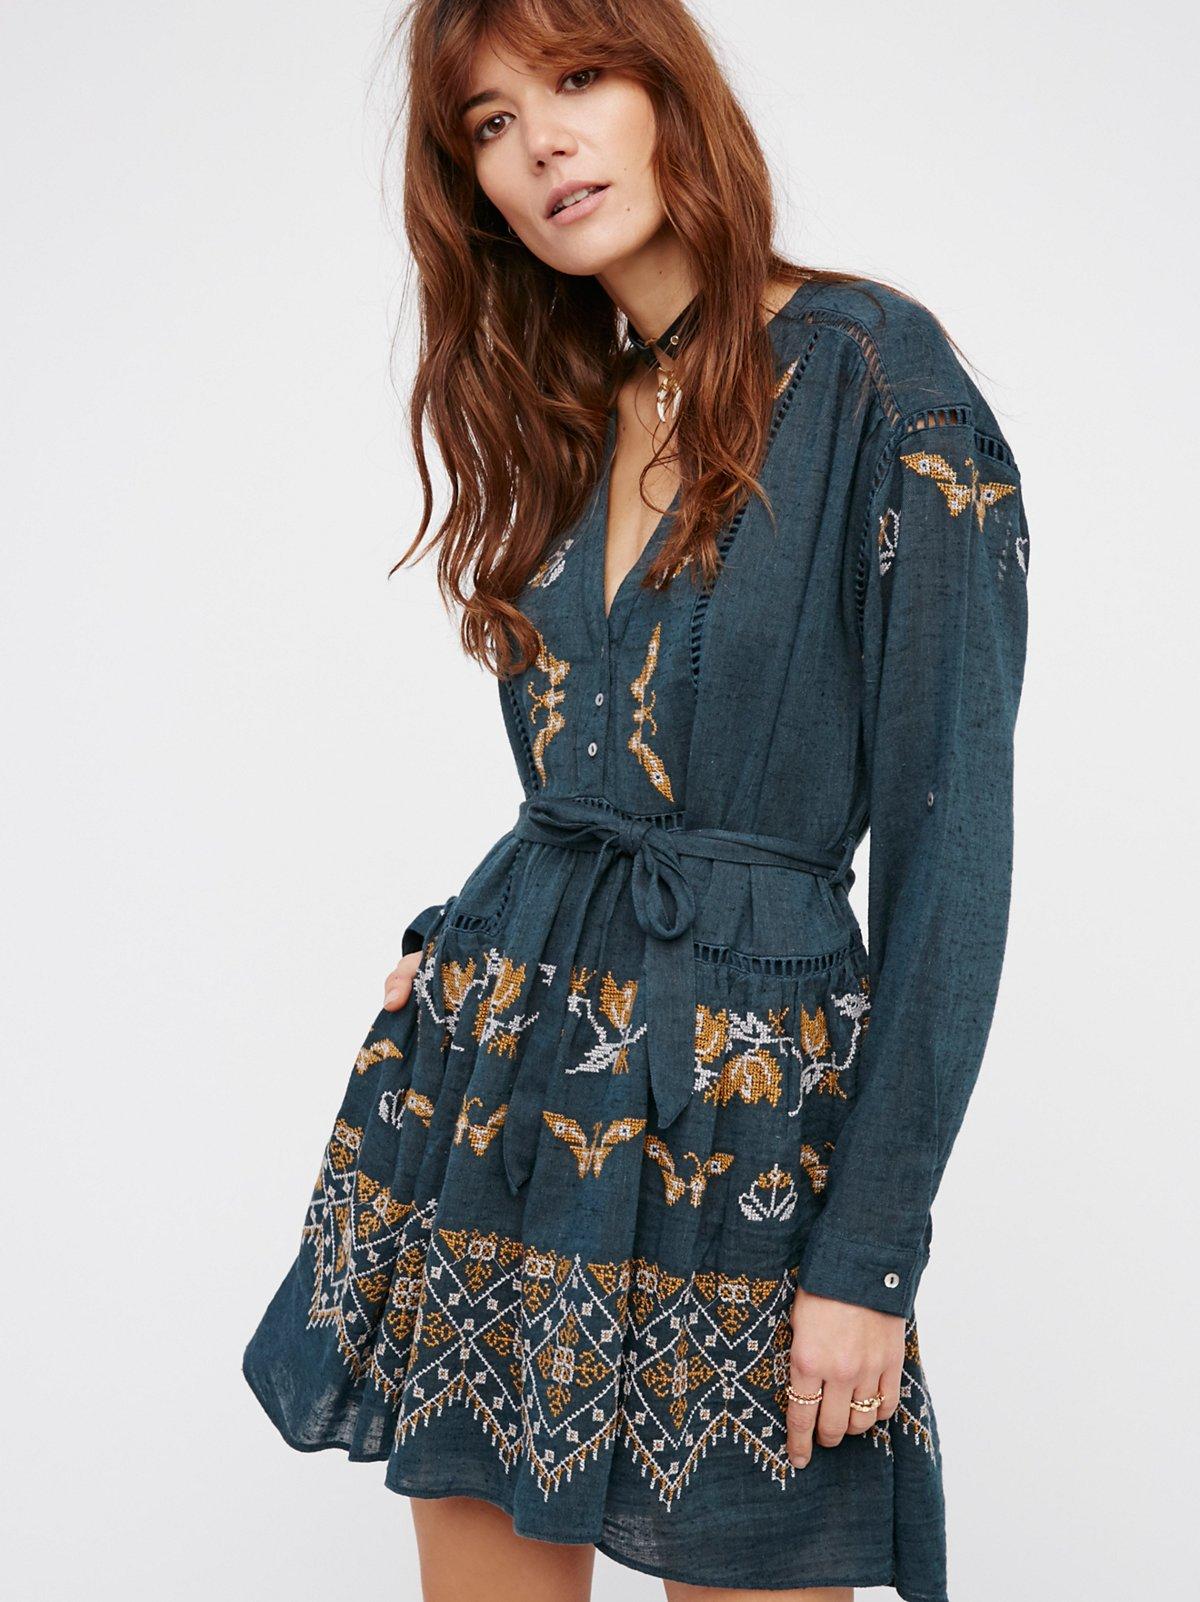 You Give Me Butterflies Dress